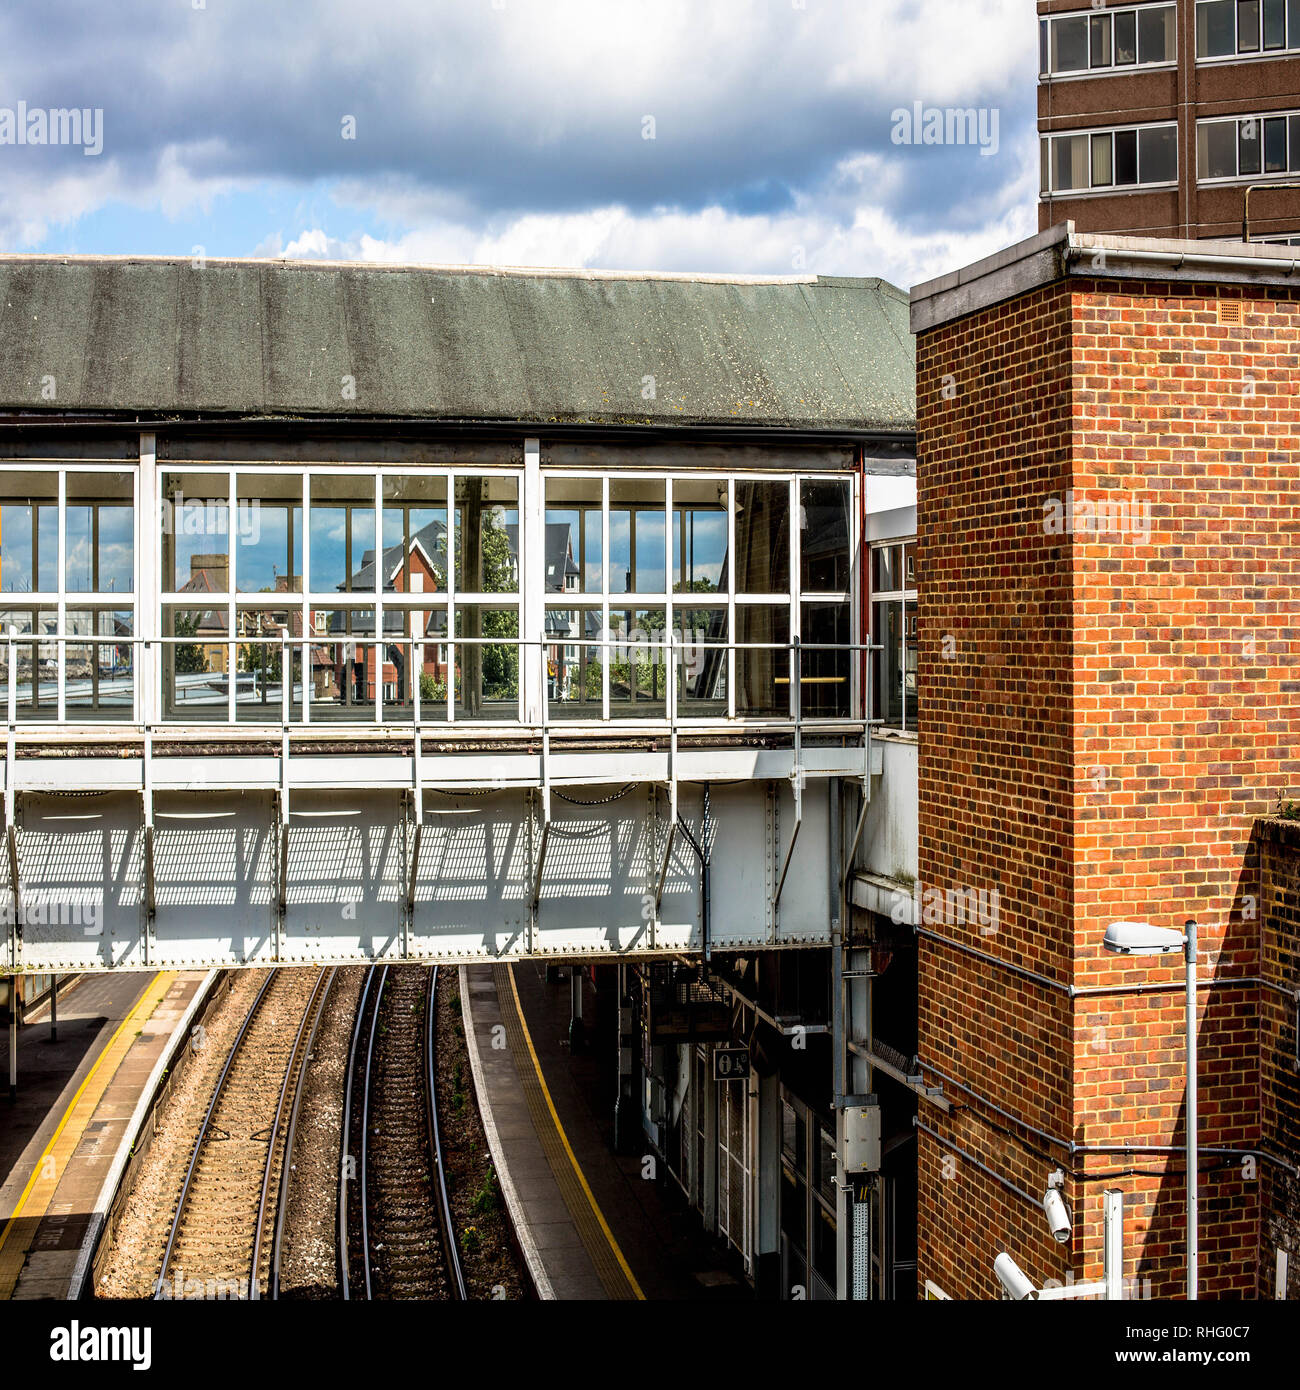 Covered Pedestrian Walkway Railway Bridge Crossing Over Rail Tracks Stock Photo